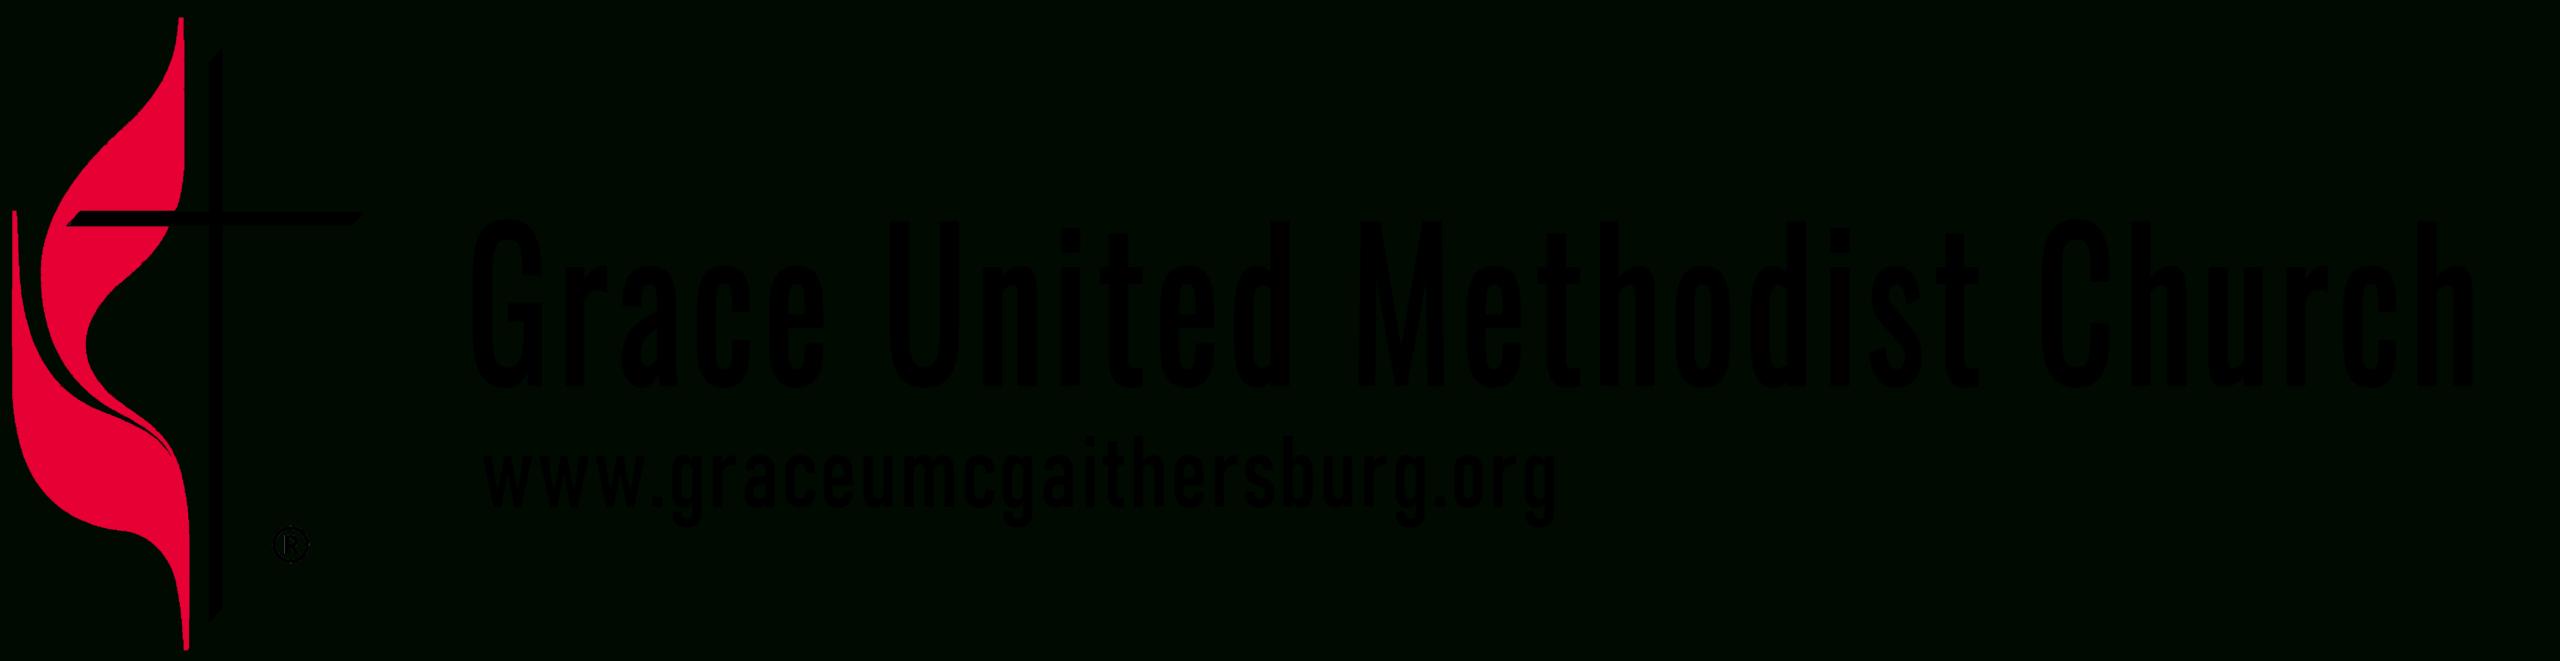 2021 Lent & Easter - Grace United Methodist Church  Lent 2021 Dates United Methodist Chrch